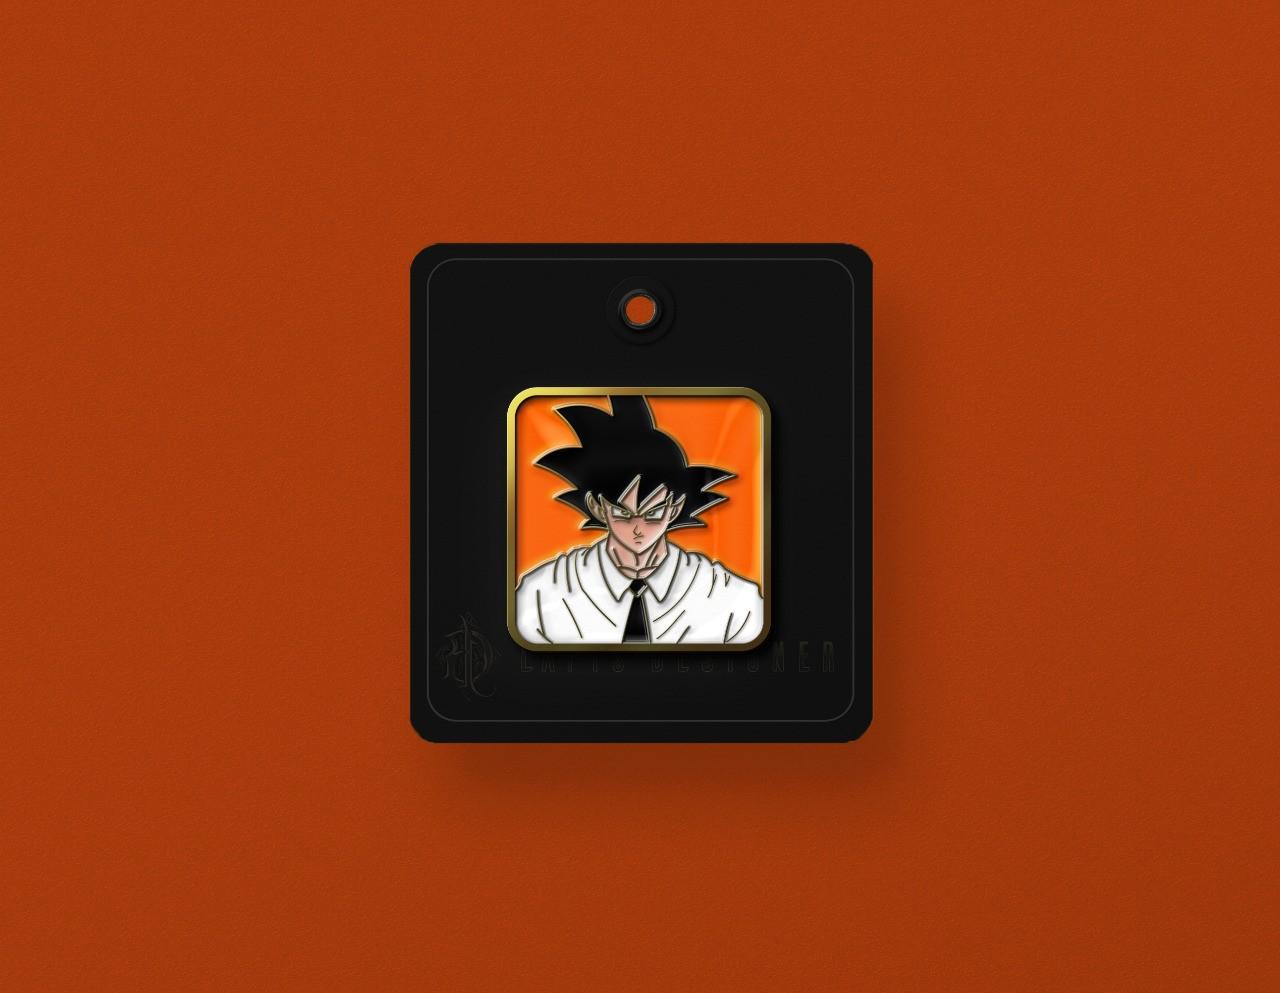 Combo Kit Pré venda 4 Goku's Envio 28/02 (apenas 50 unidades) - 4 unidades